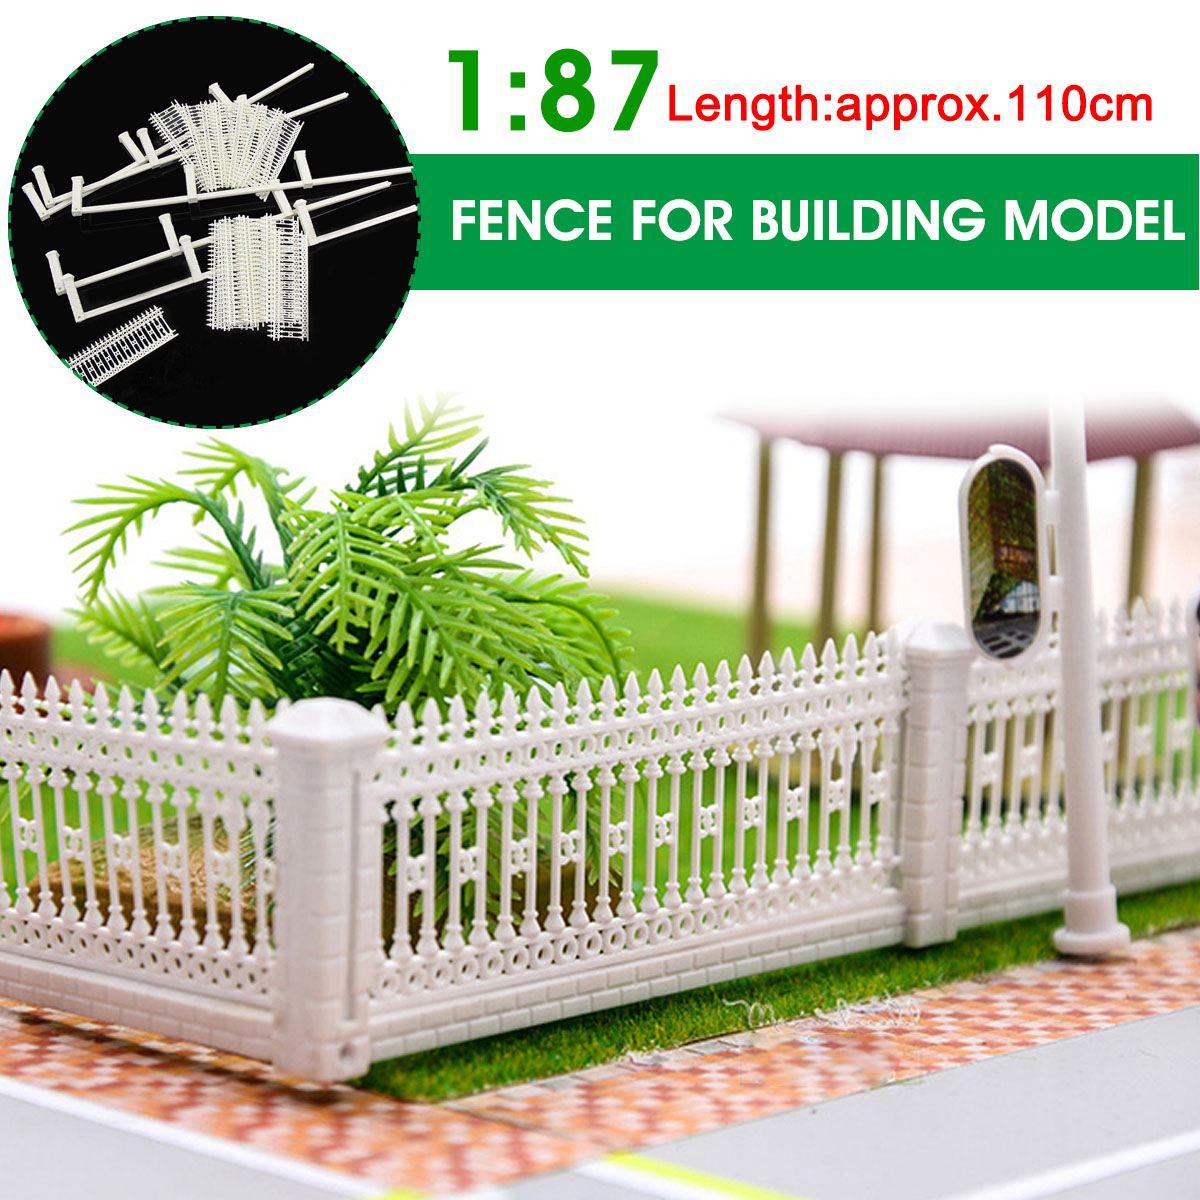 LBLA 1:87 Scale Model Train Truck Railway Building Fence Wall HO Z Scale 110cm DIY Building Sand Table Model Detachable Kids Toy